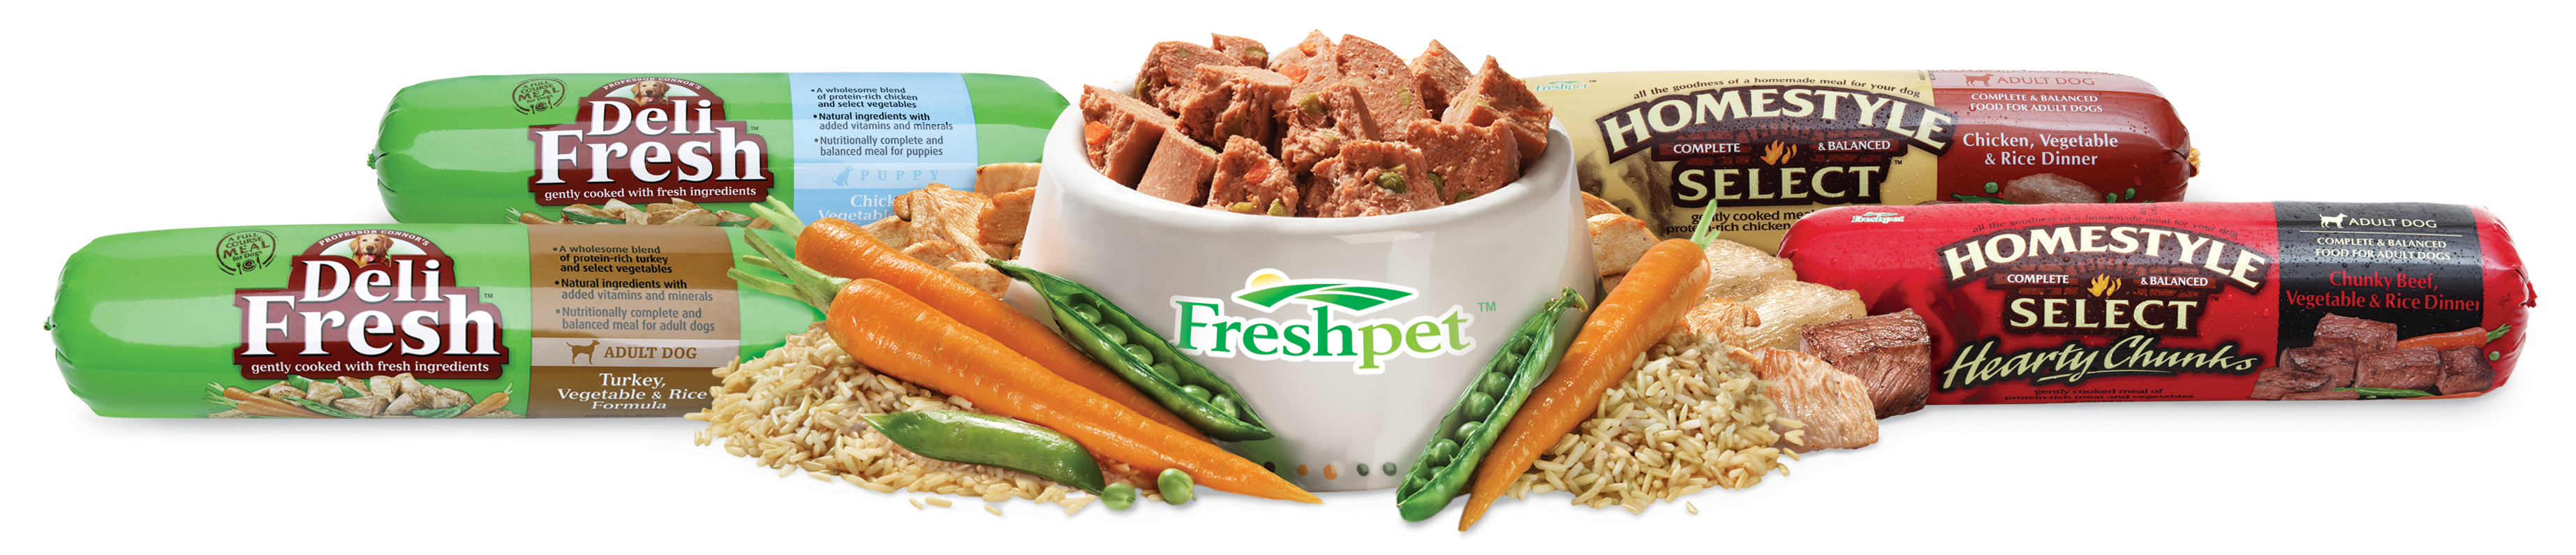 Deli Fresh Dog Food Goldenacresdogs